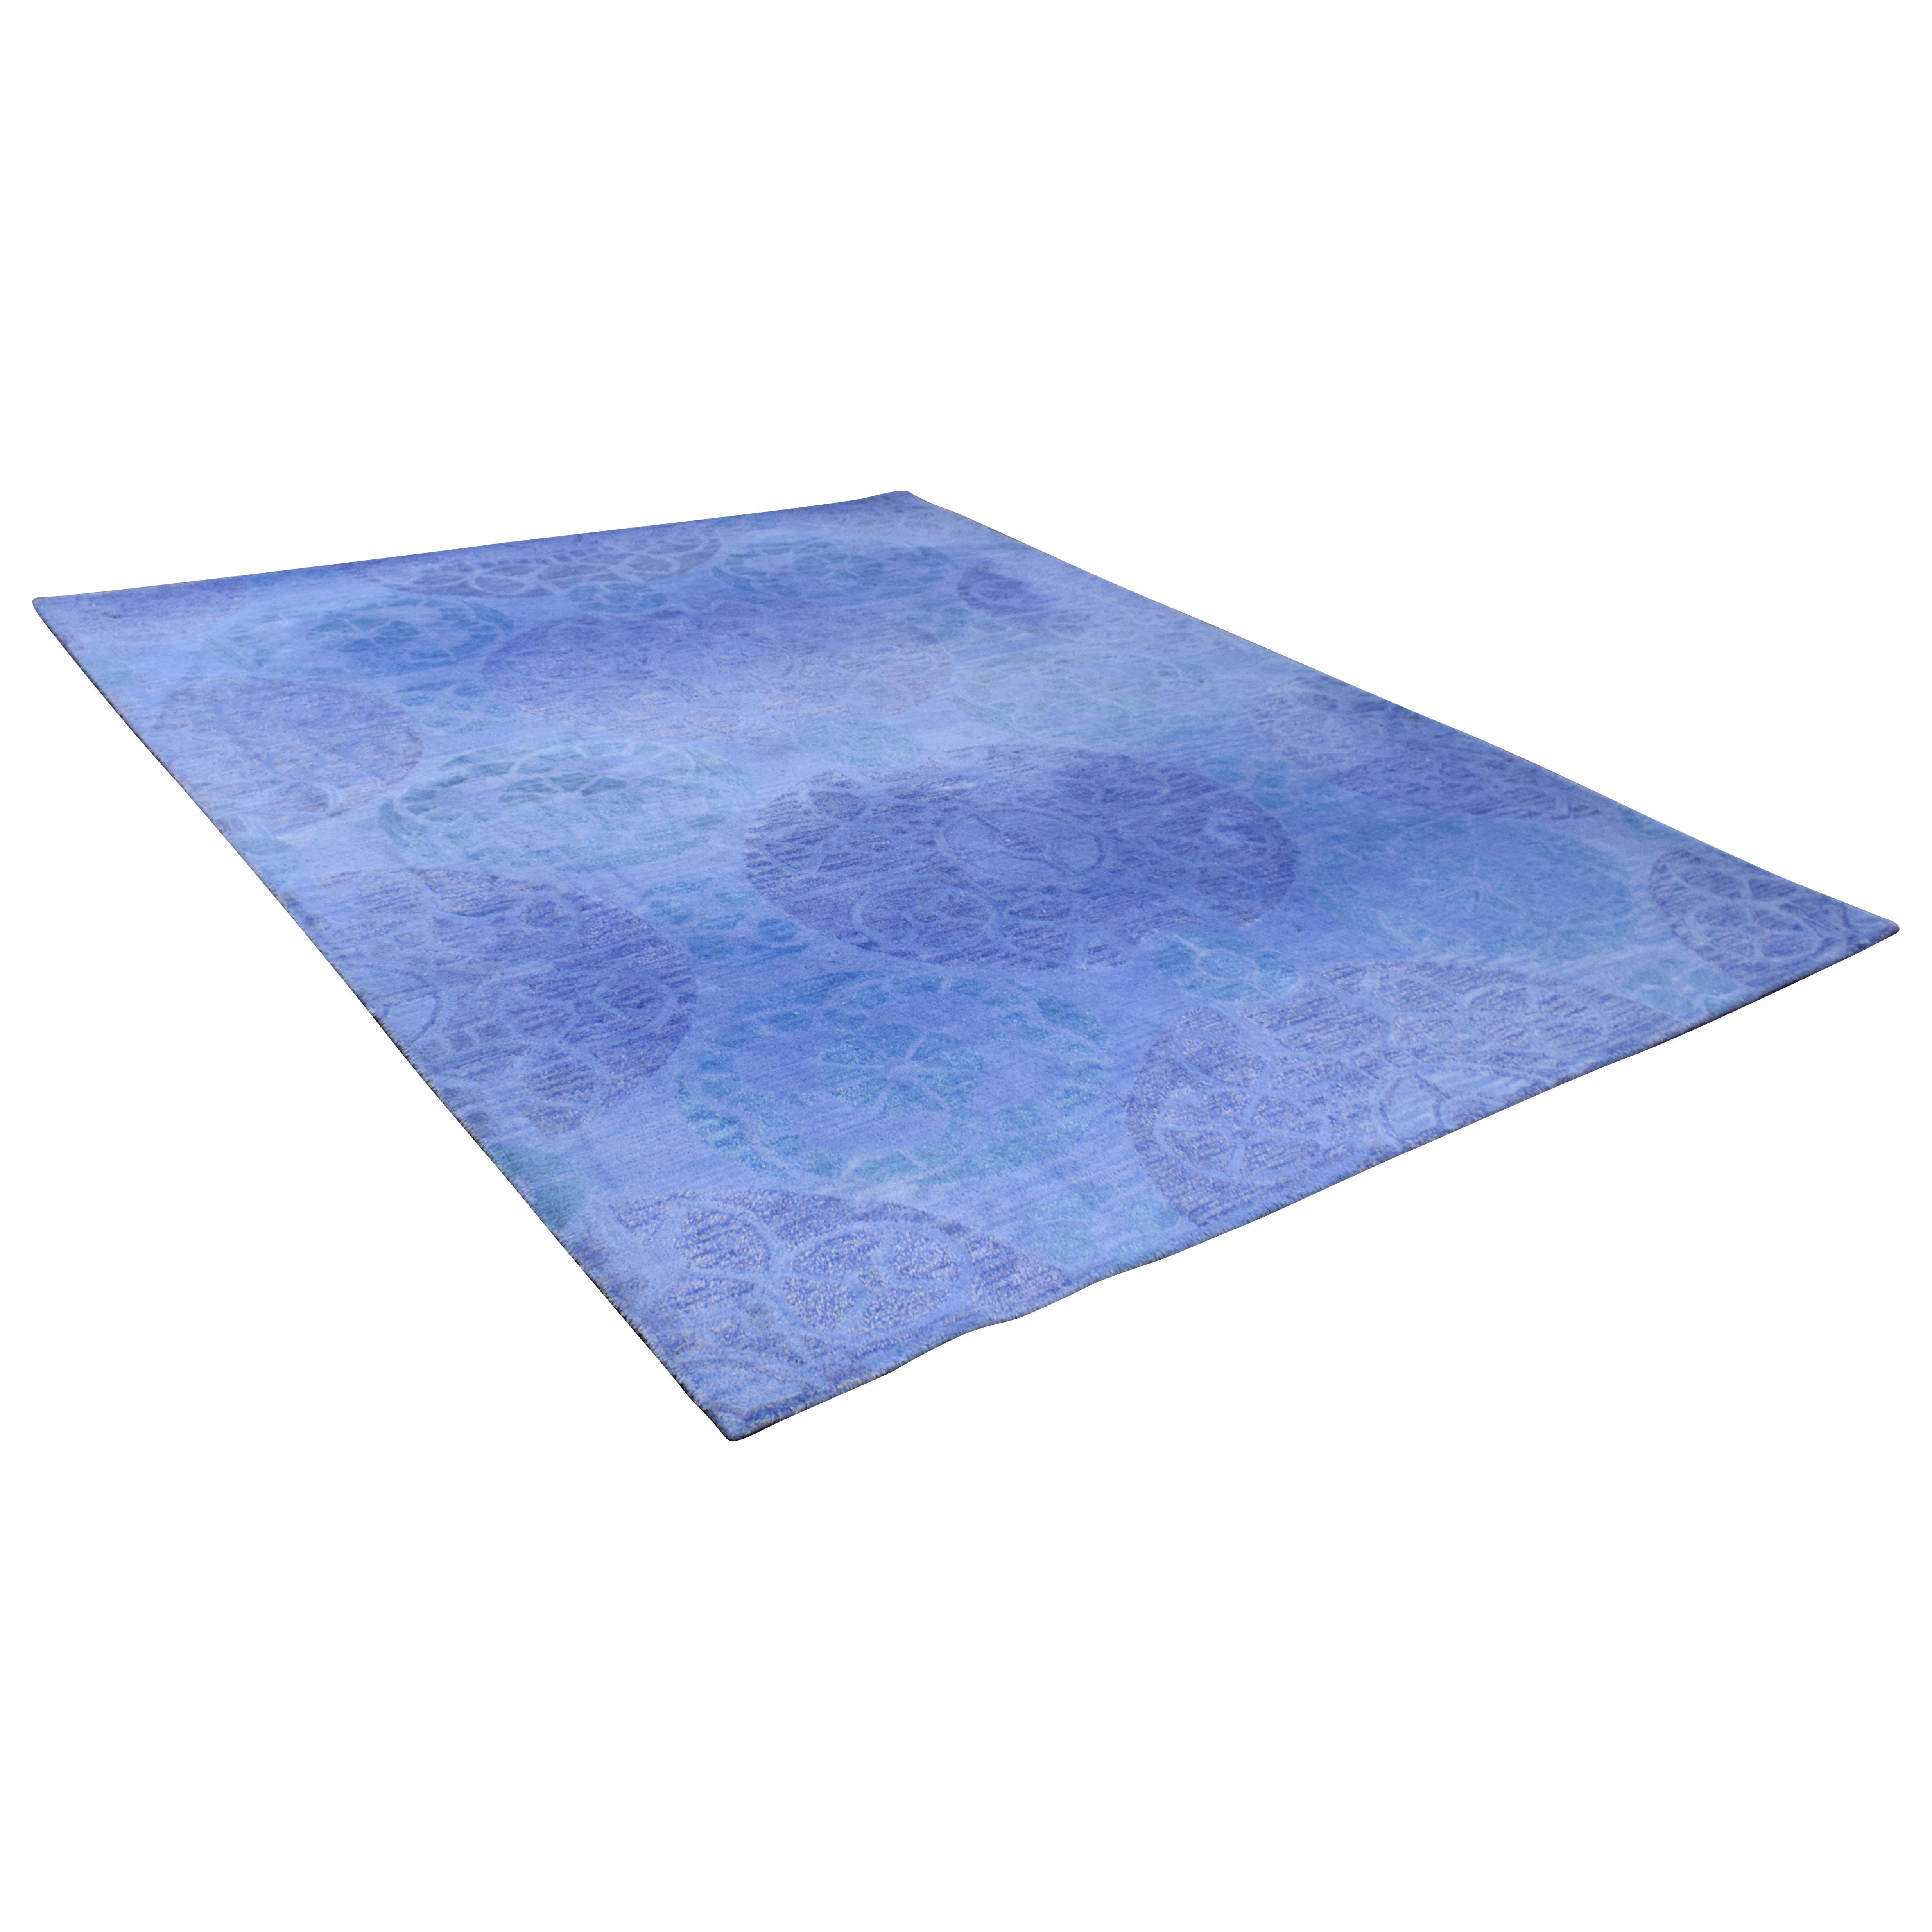 Safavieh Safavieh Wyndham Rug blue